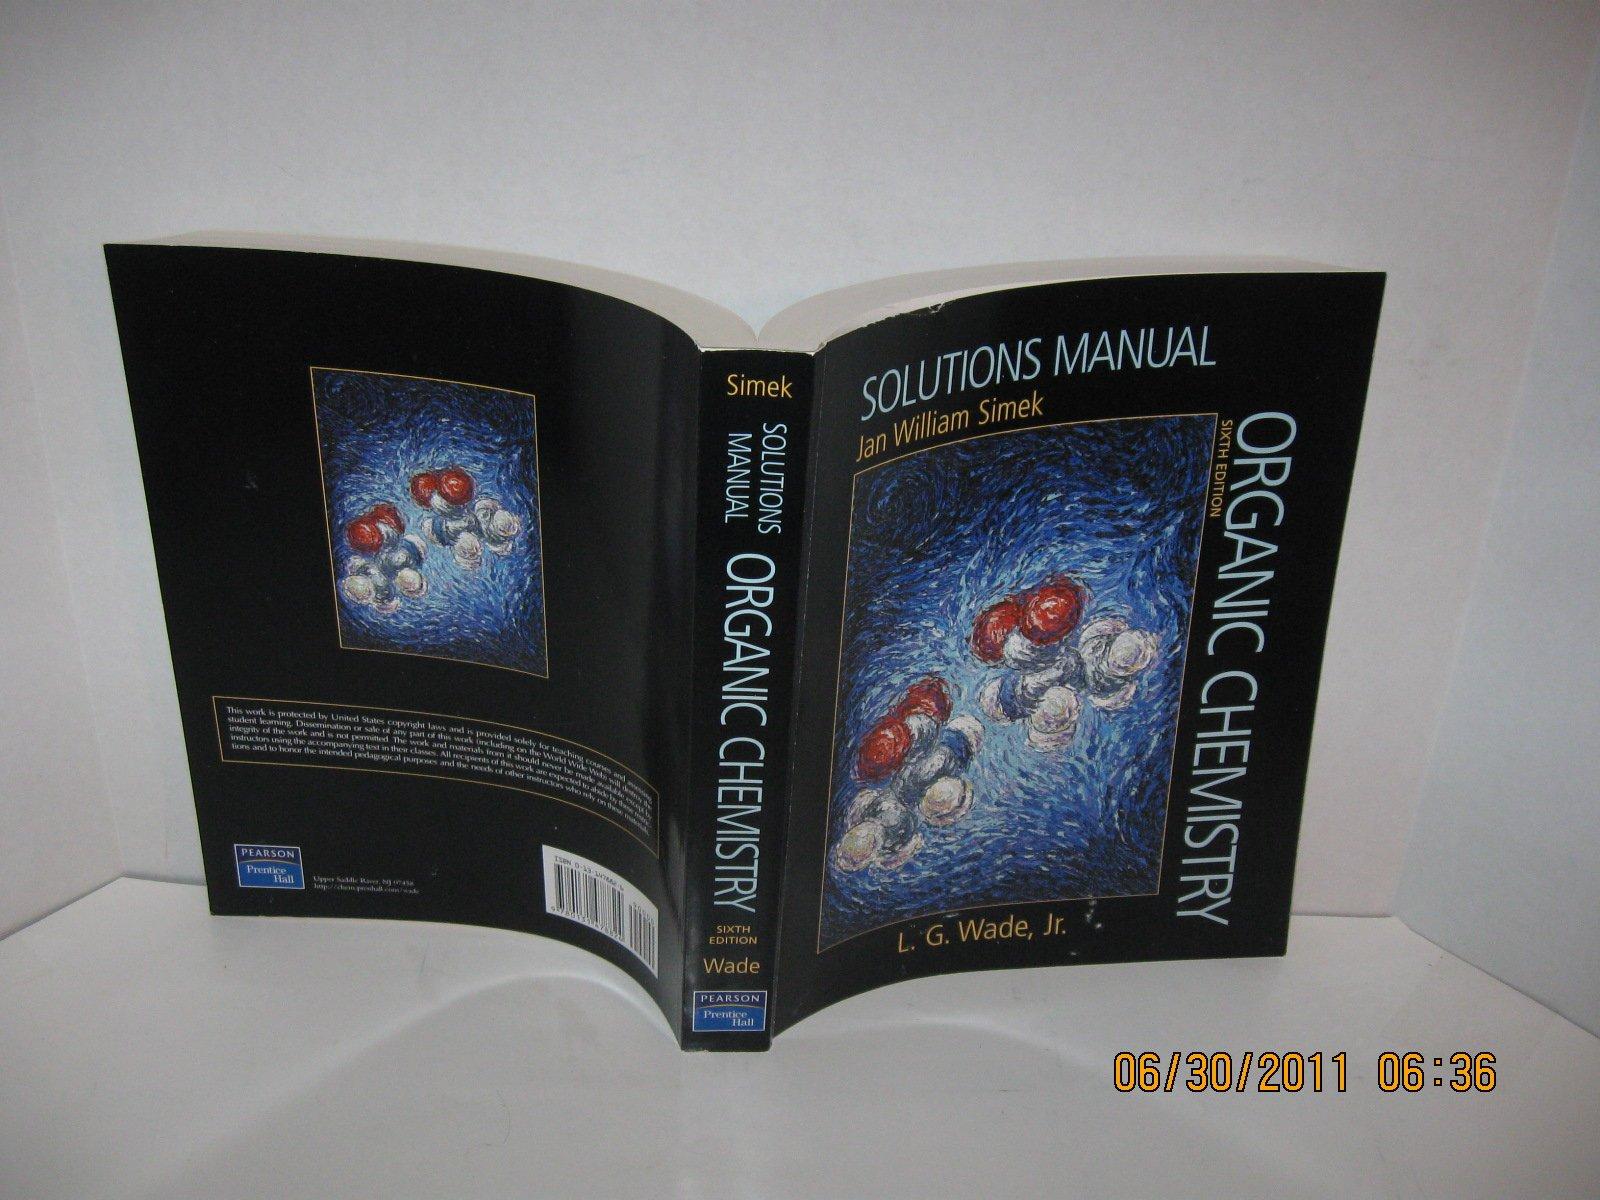 Organic Chemistry Textbook & Solutions Manual (2 Books): L. G. Wade; Jan  William Simek: Amazon.com: Books